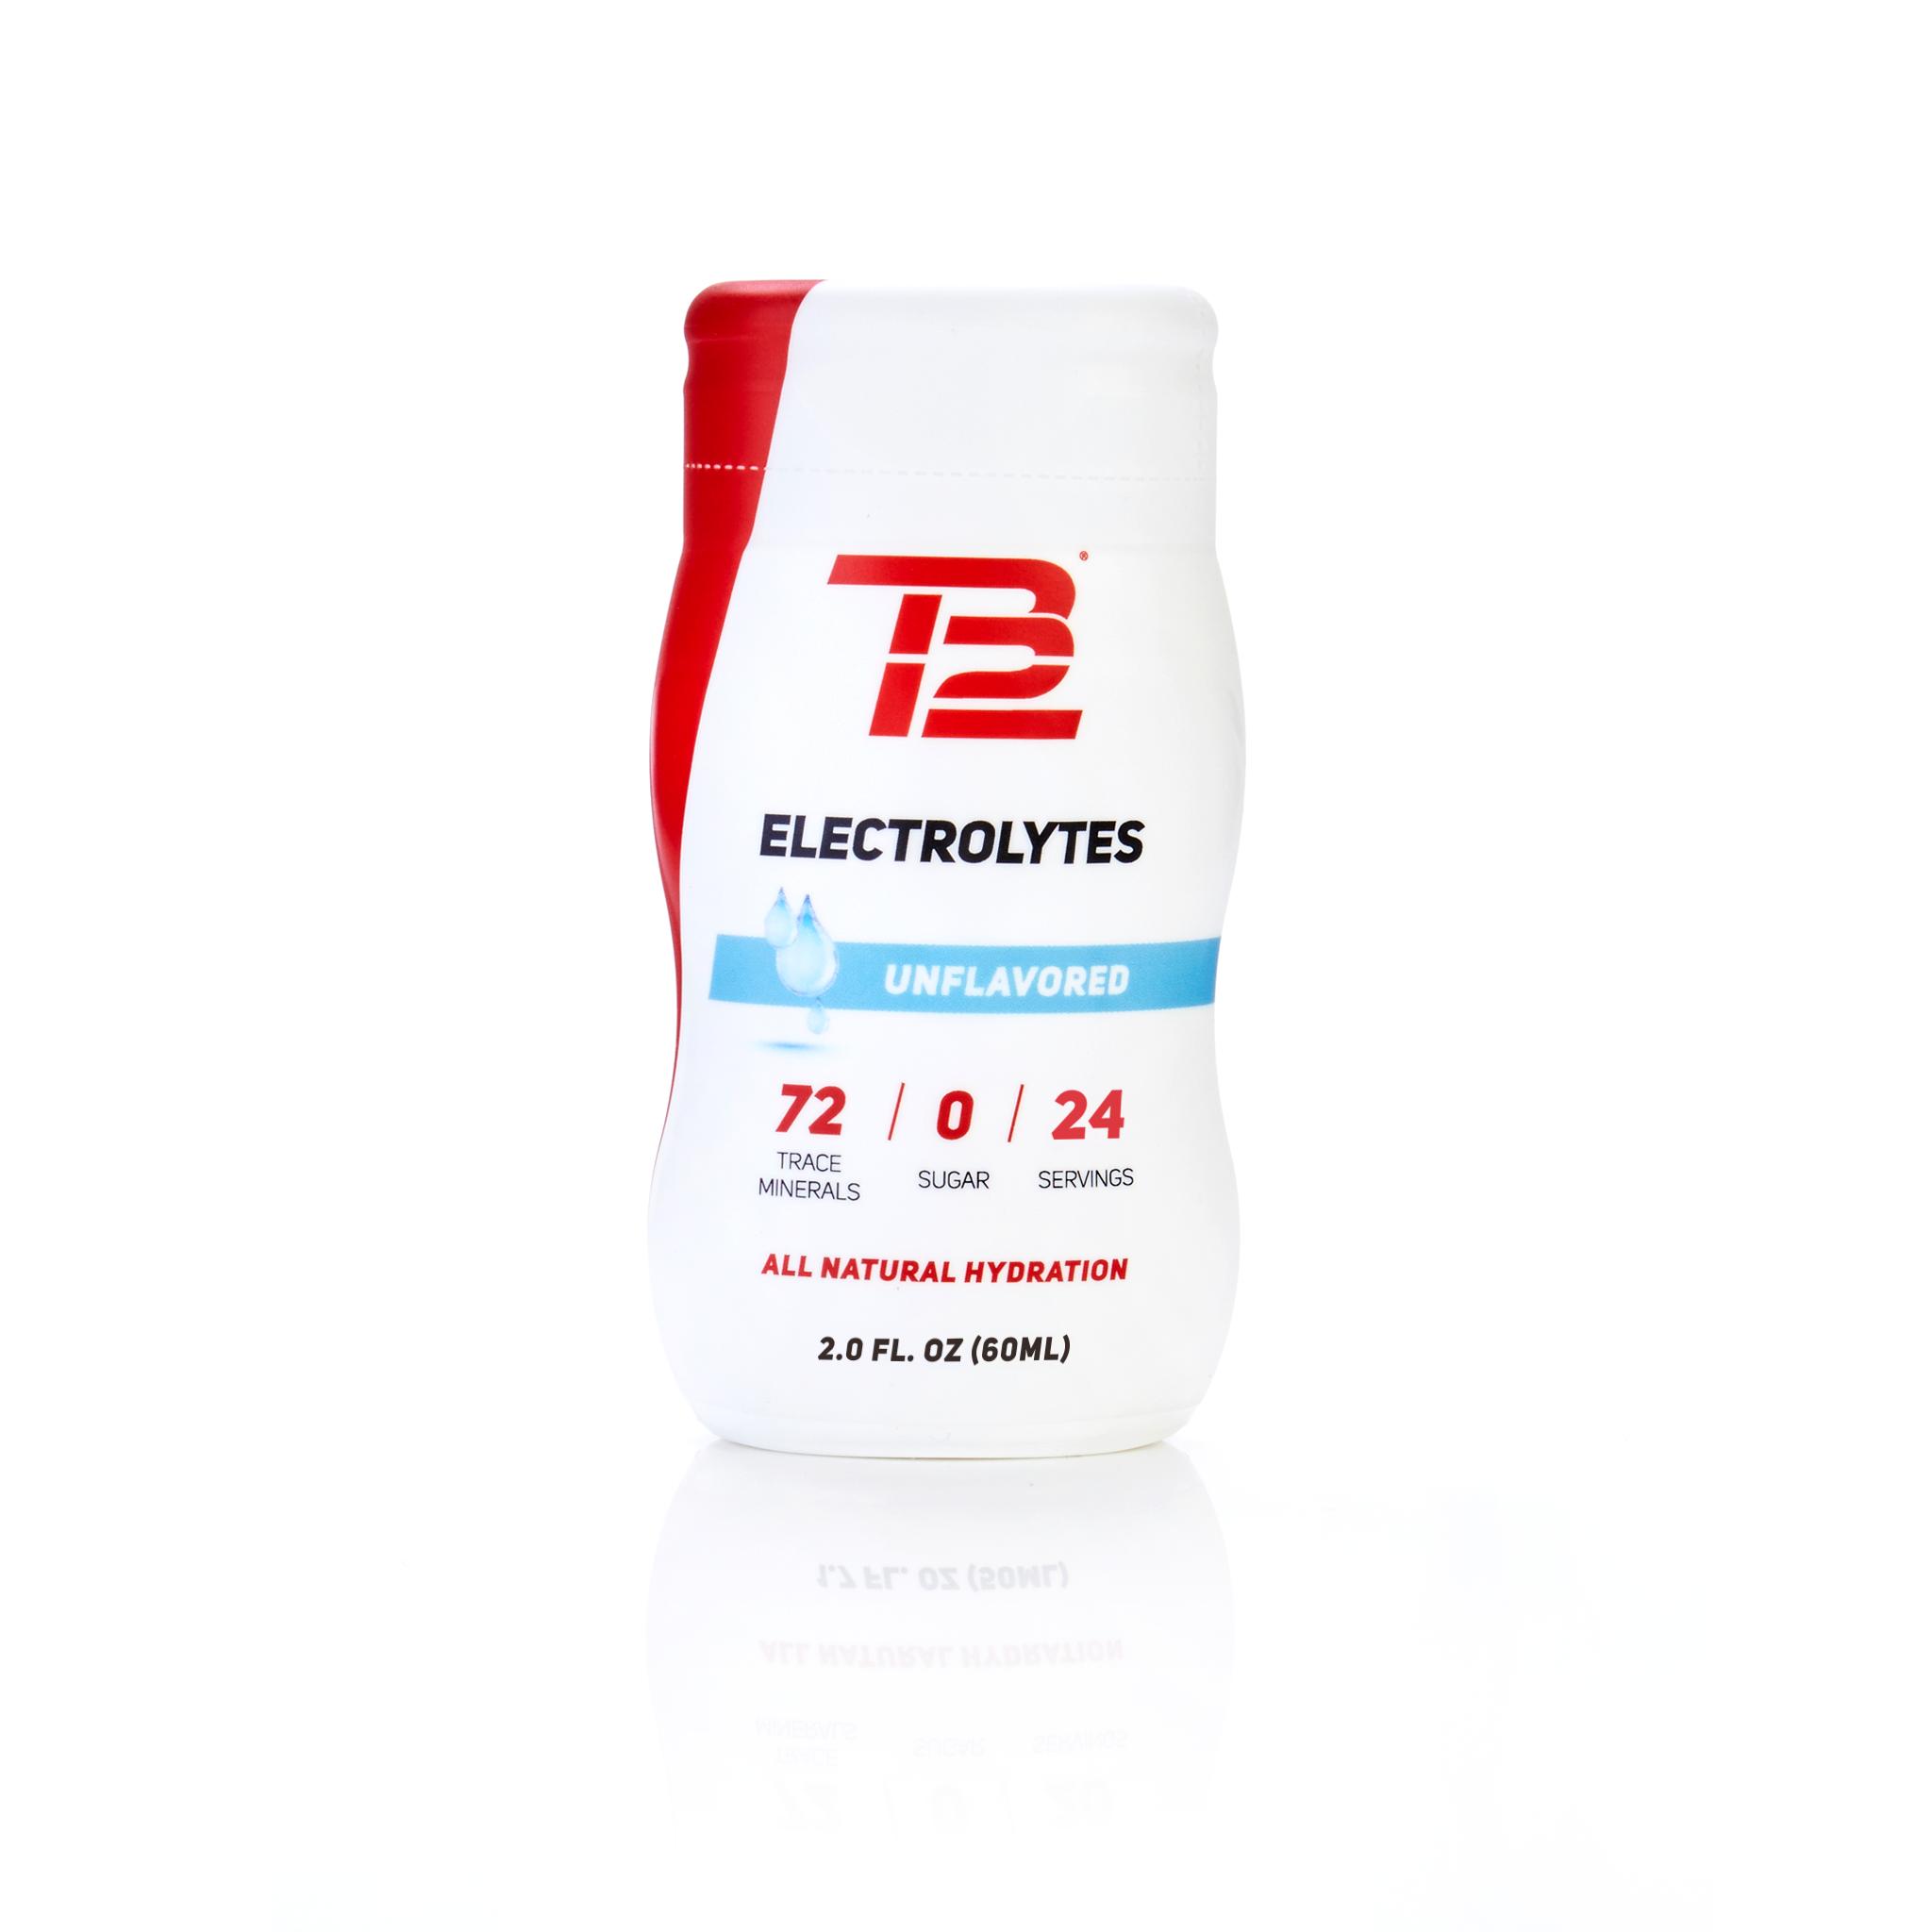 TB12 Electrolytes Front